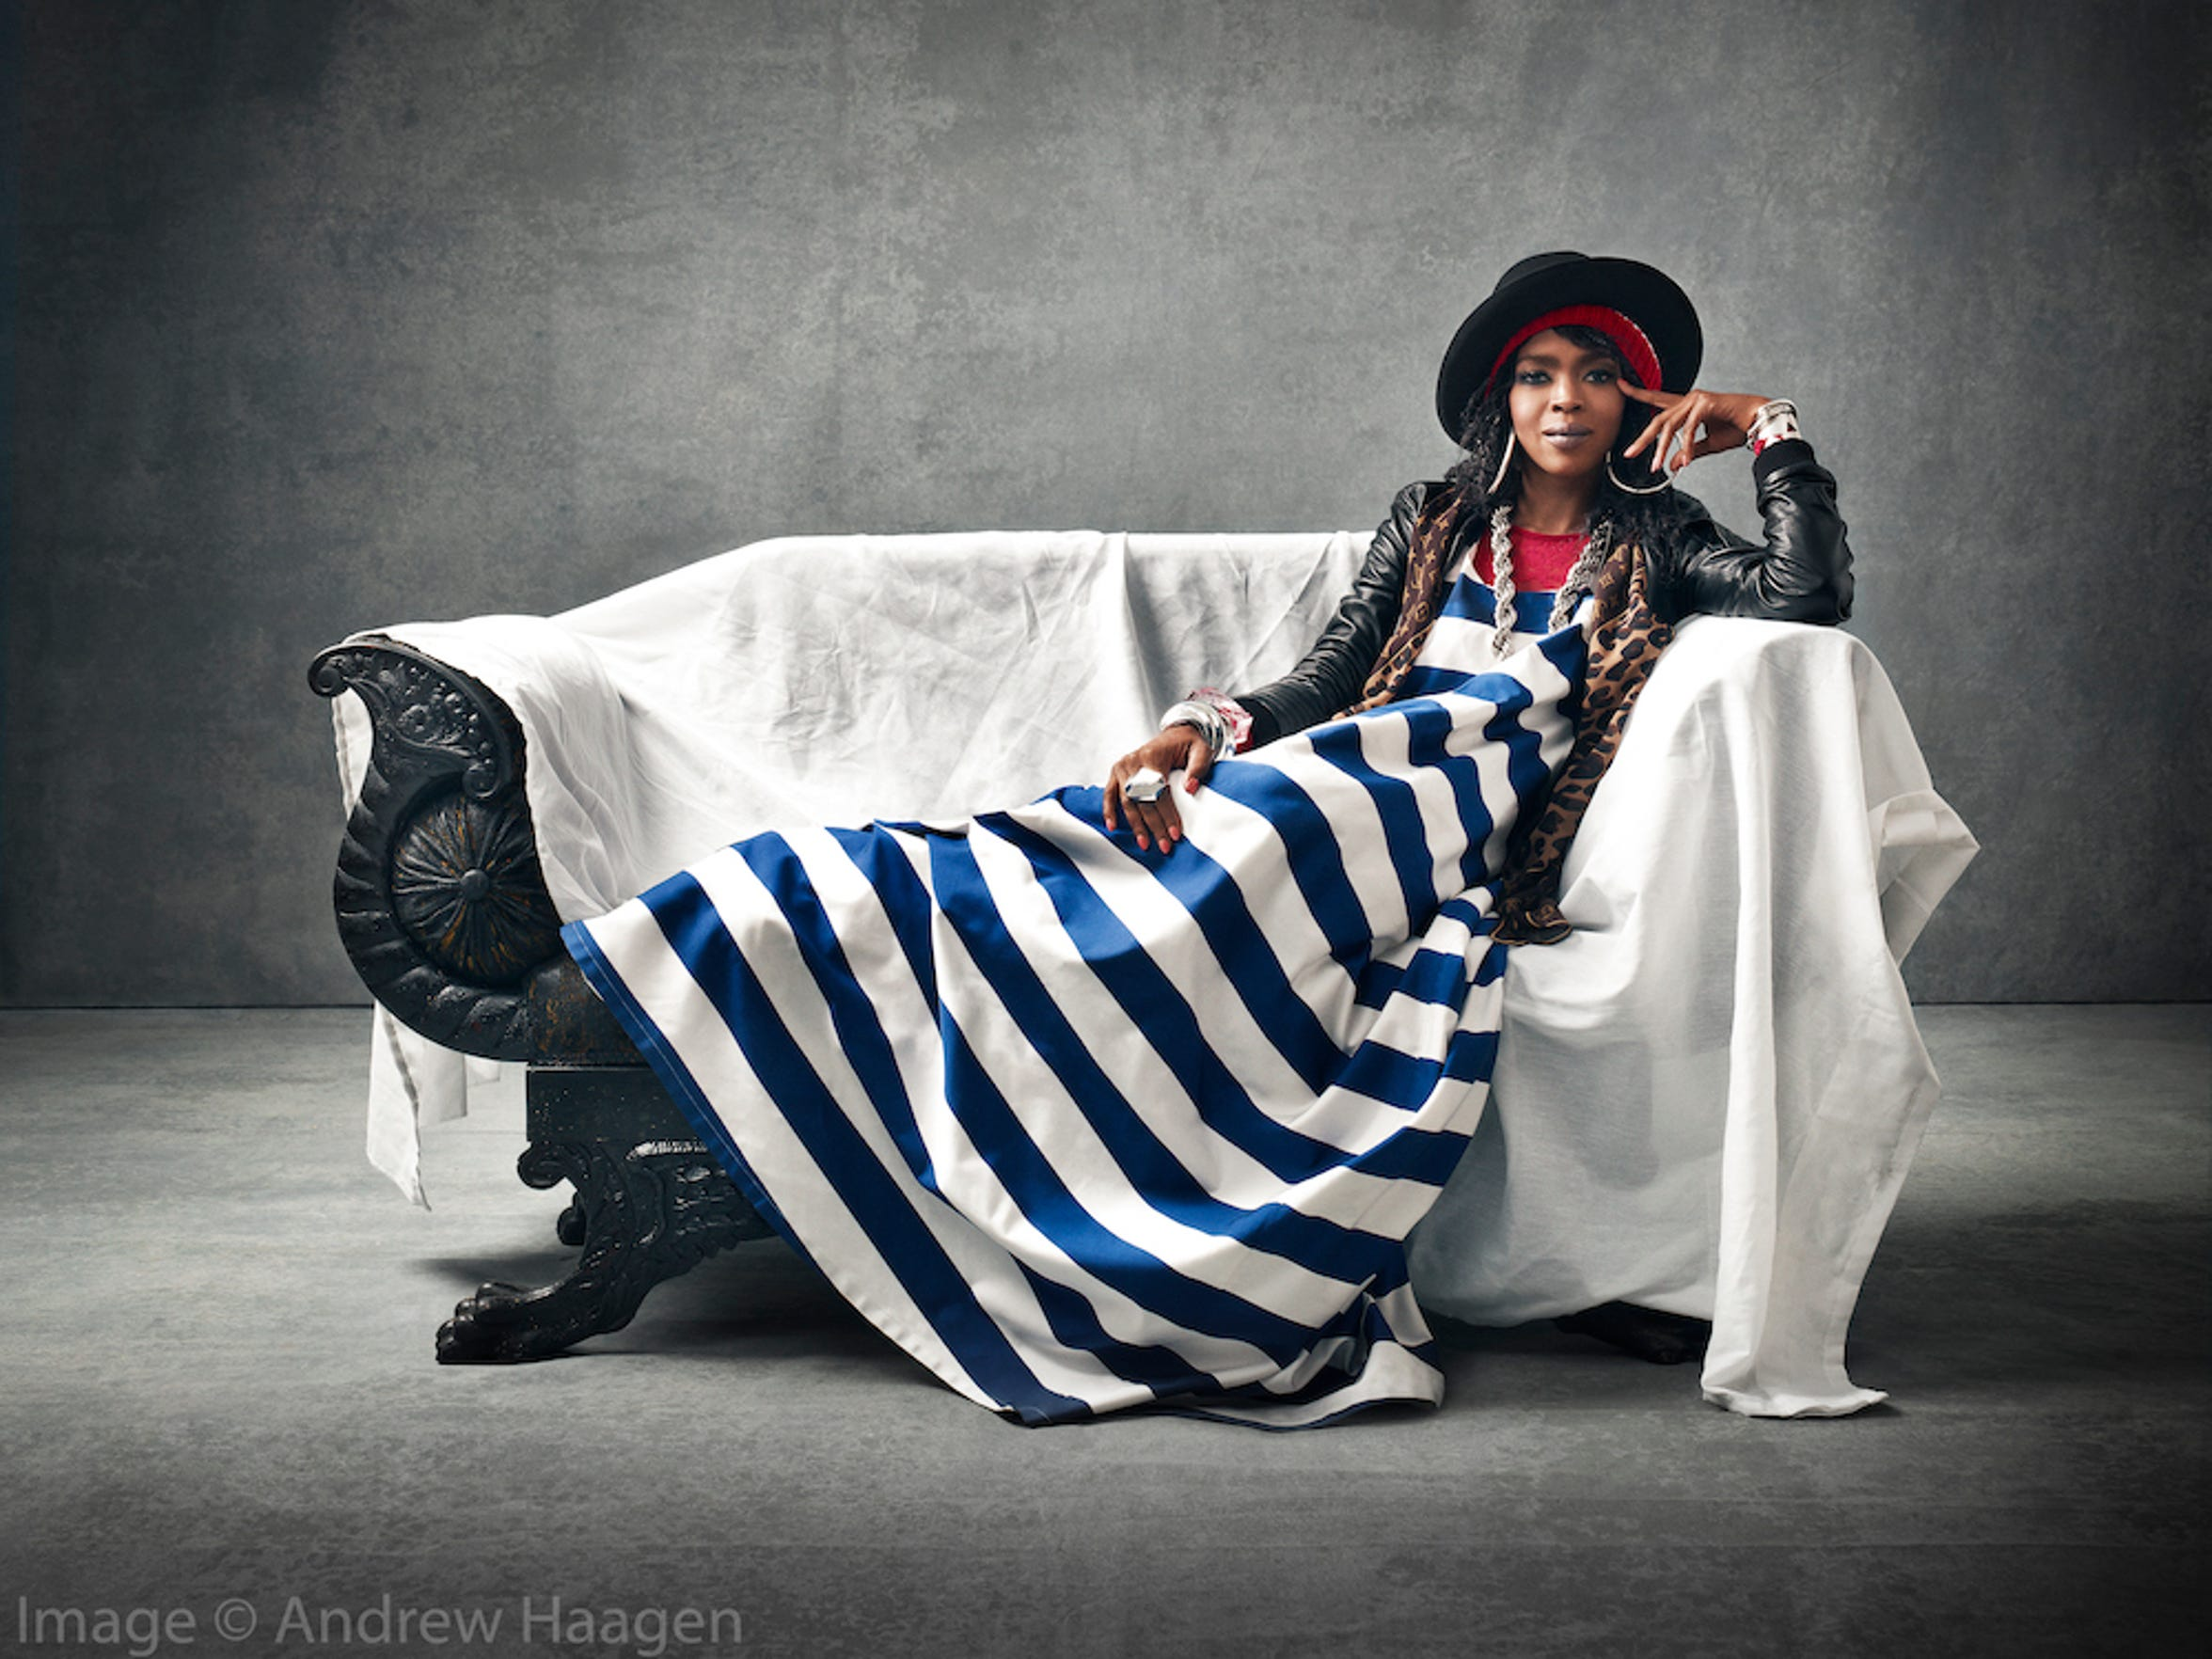 Photographer Andrew Haagen captured Lauryn Hill's regal quality.